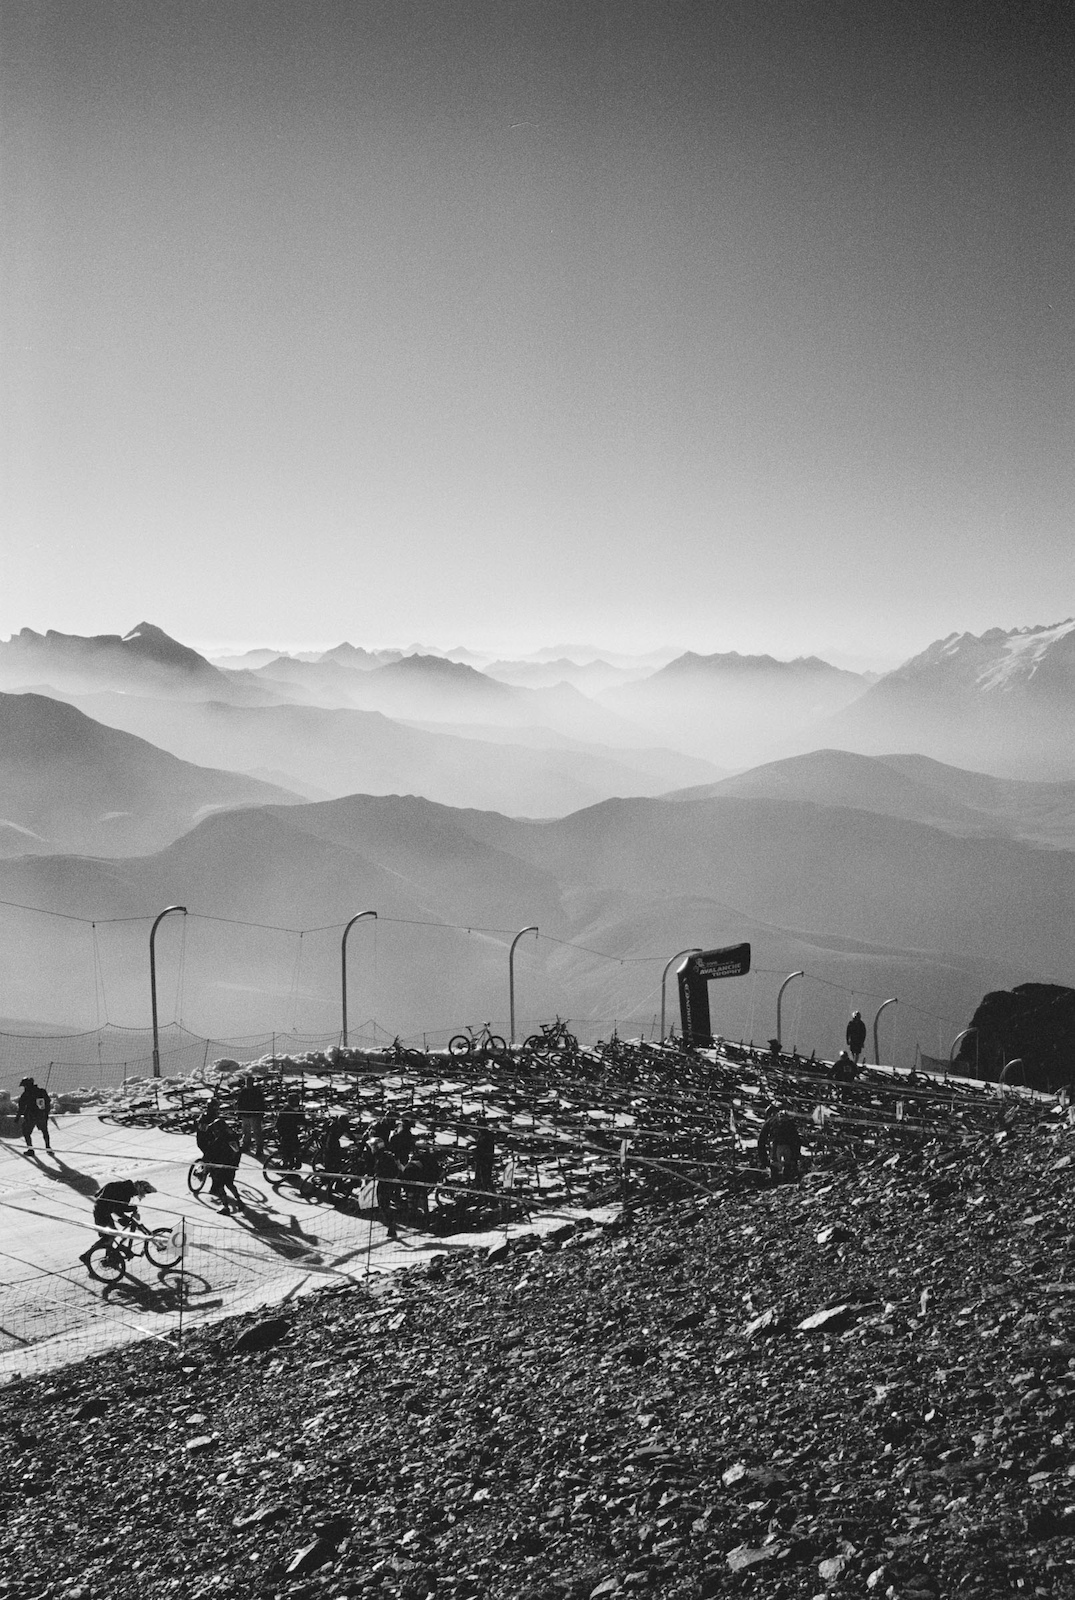 Start of the Megavalanche 2007 Pic Blanc 3300m